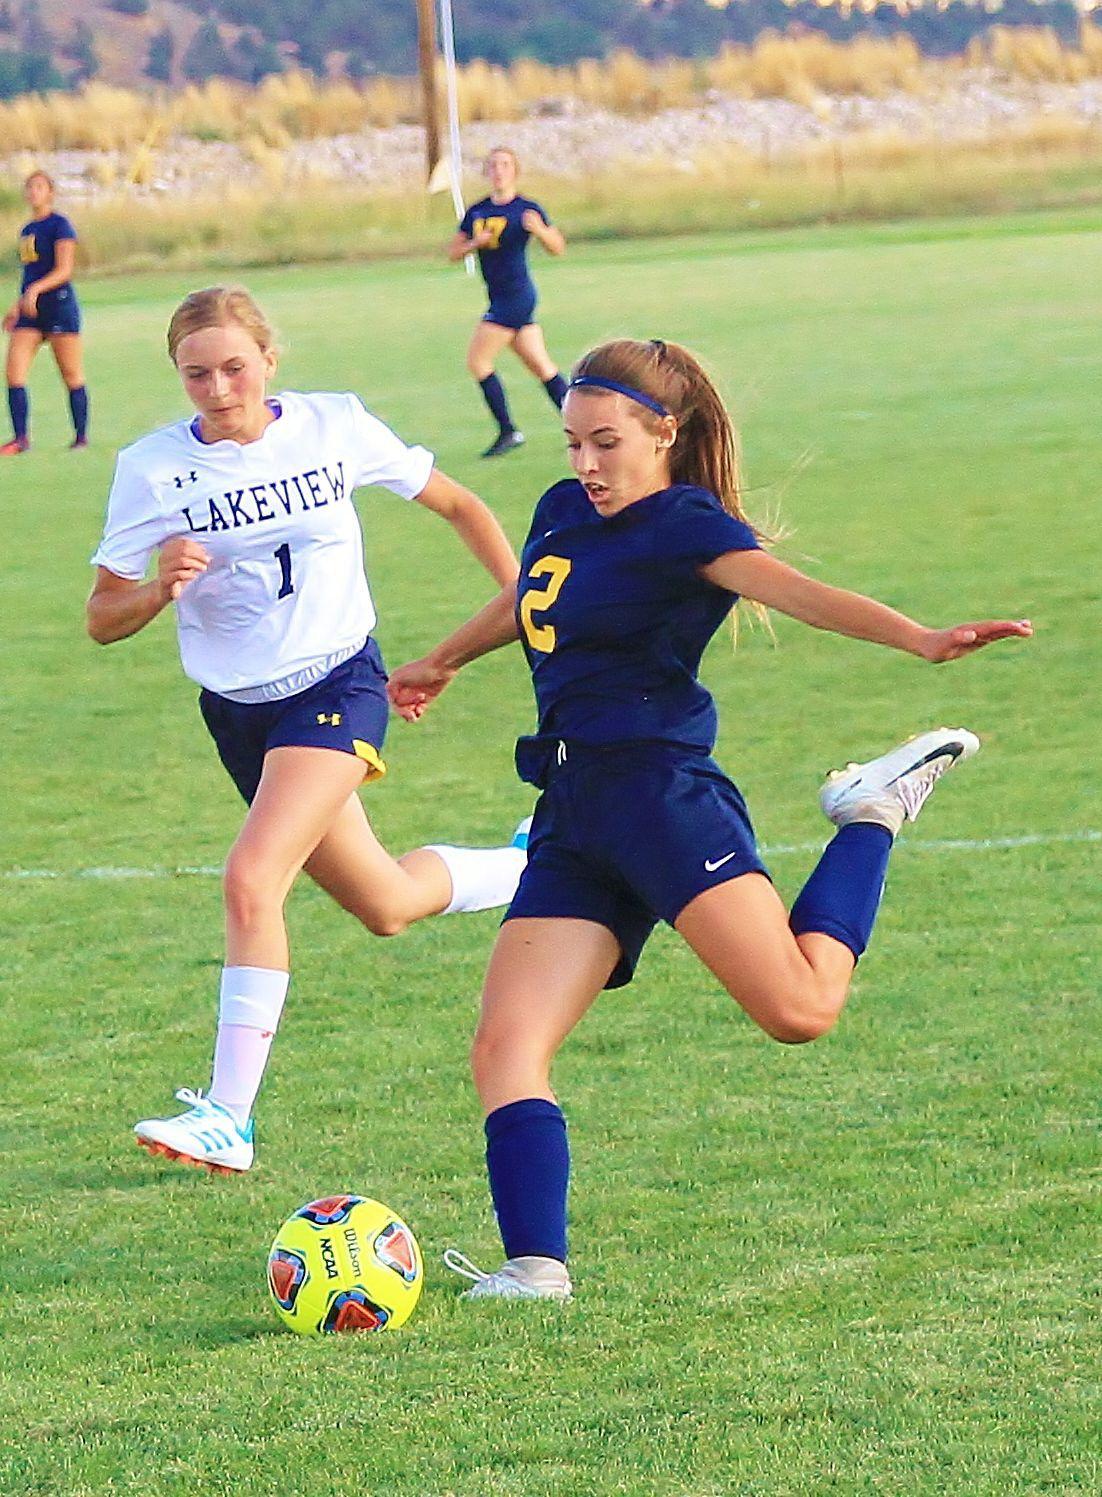 Lakeview at Henley girls soccer (1).JPG